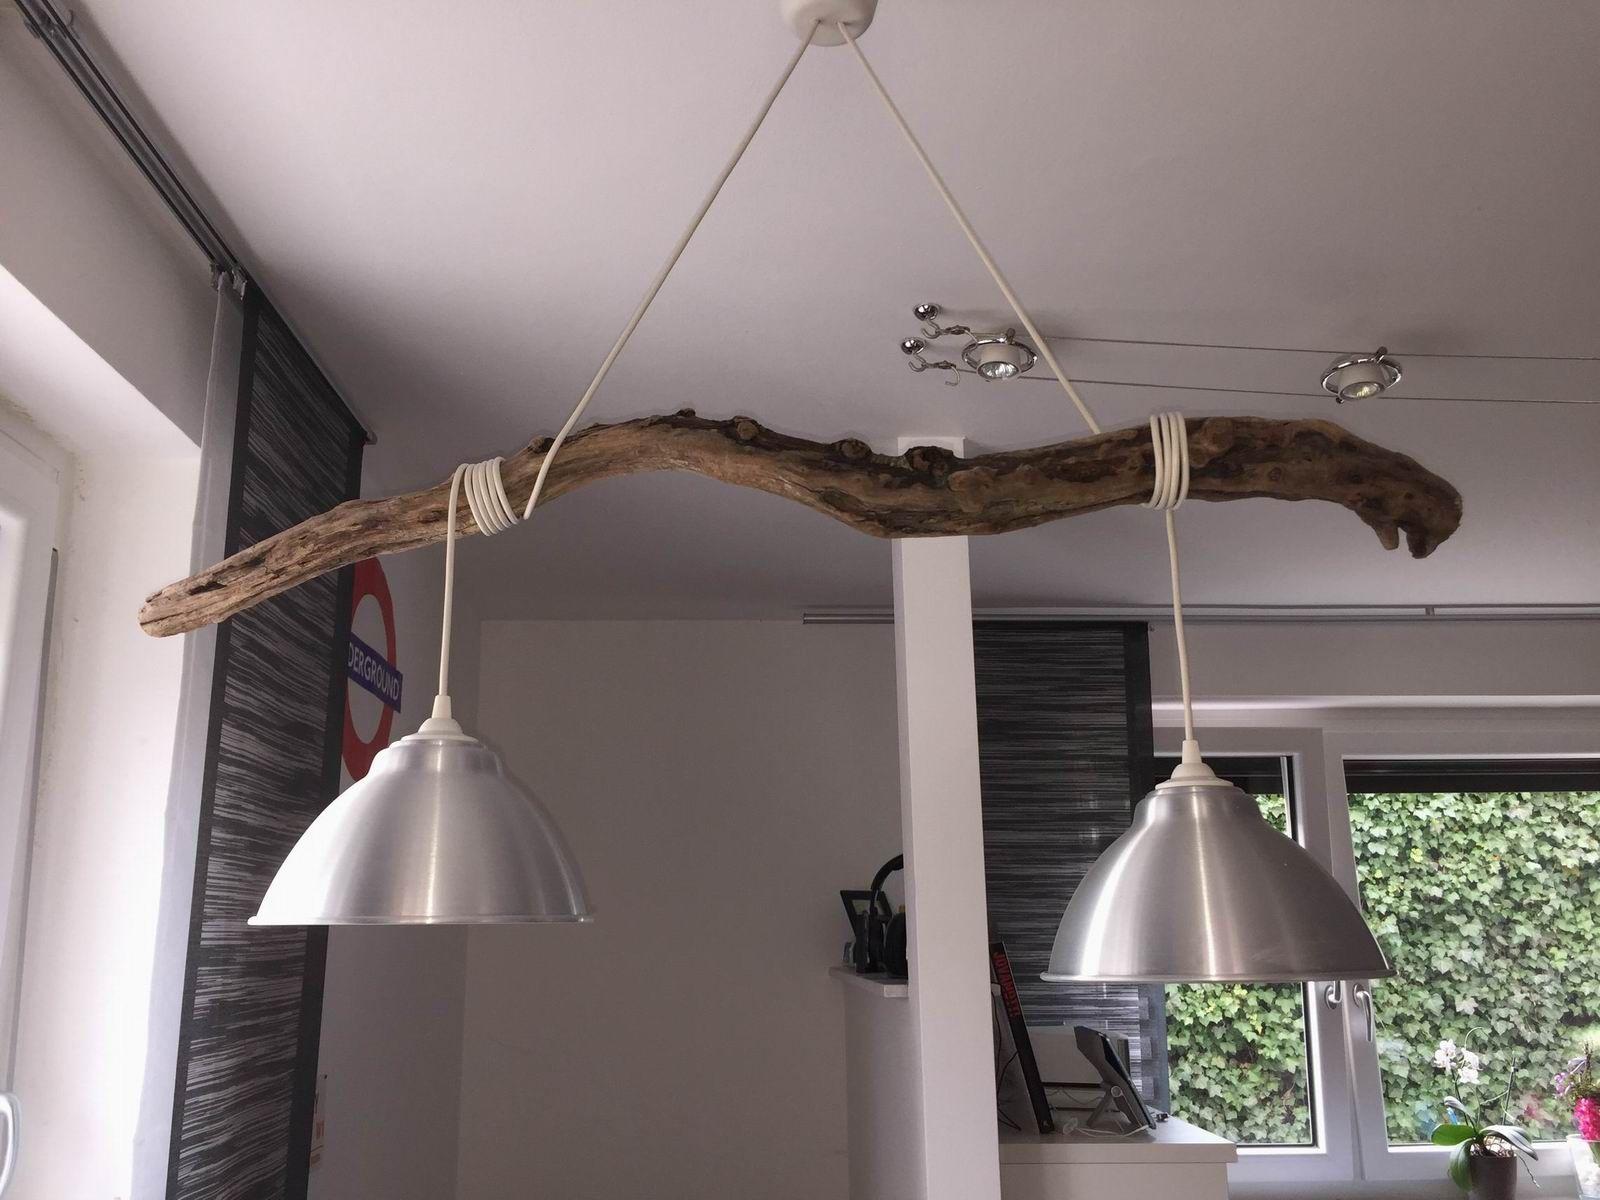 Küchenlampen Hängend ~ Lampe aus schwemmholz treibholz lampen pinterest treibholz